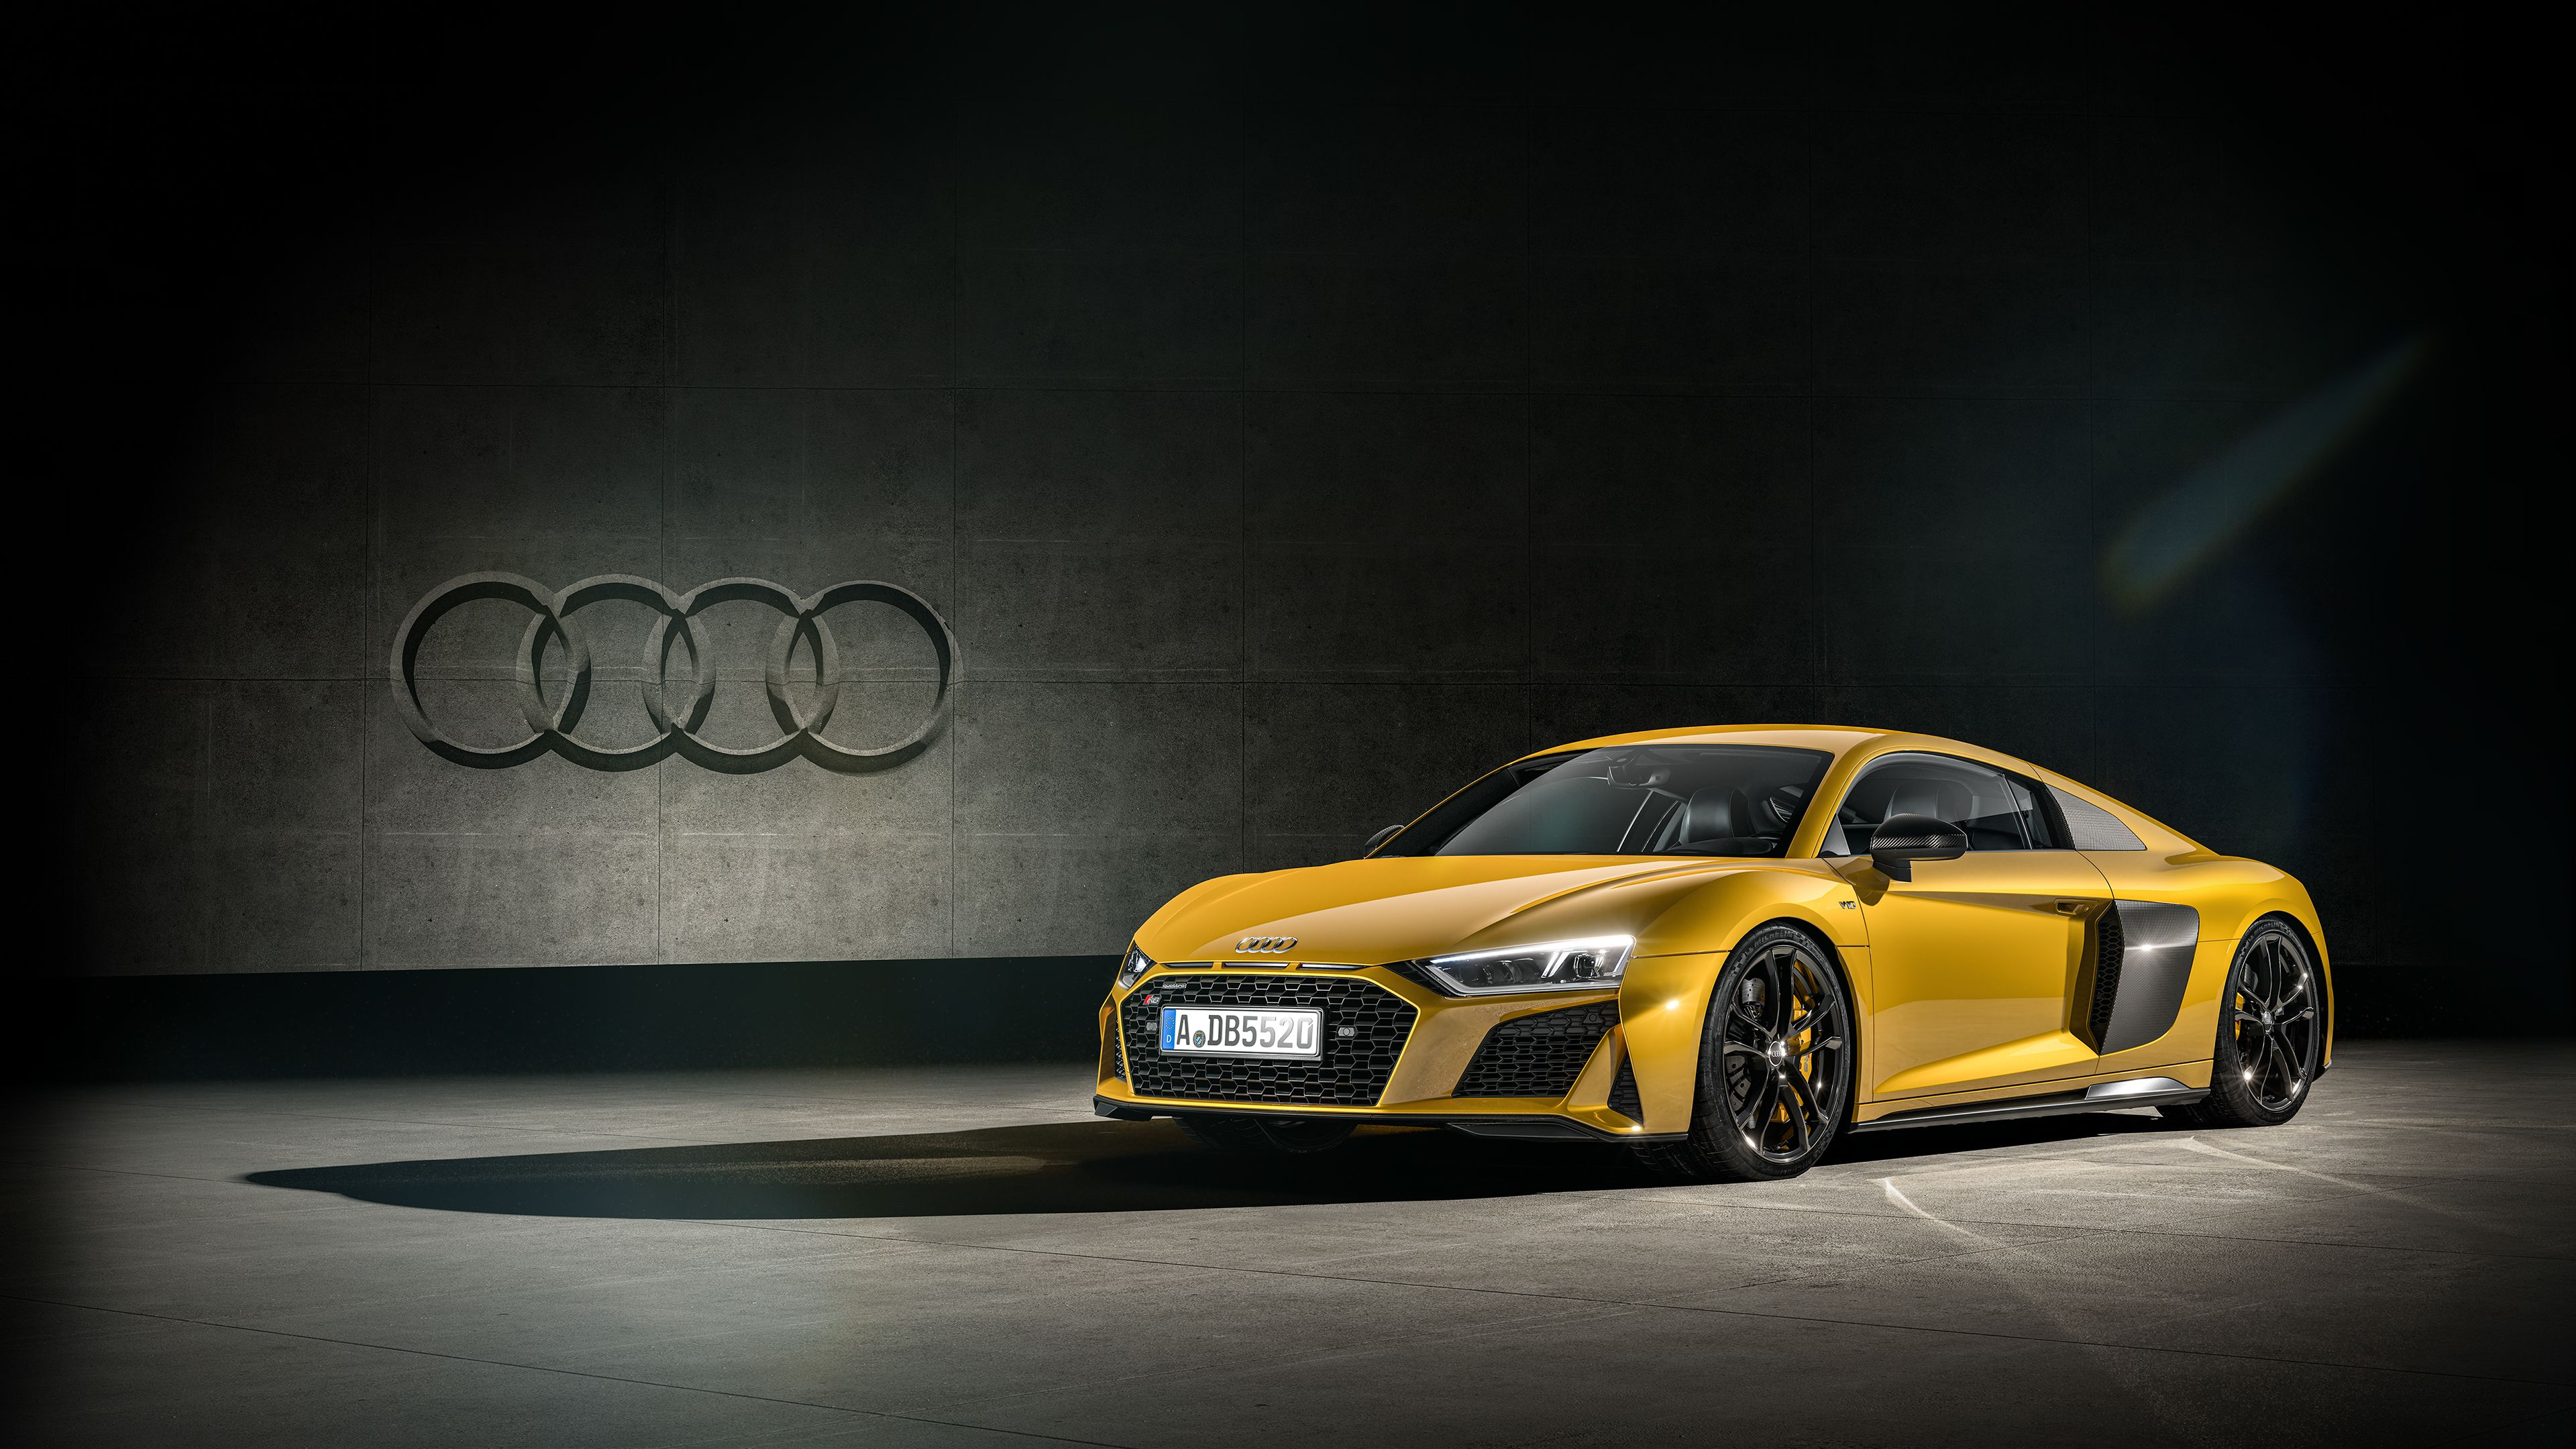 Audi R8 Yellow 4k Audi R8 Yellow 4k Wallpapers Audi Audi R8 Automotive Design